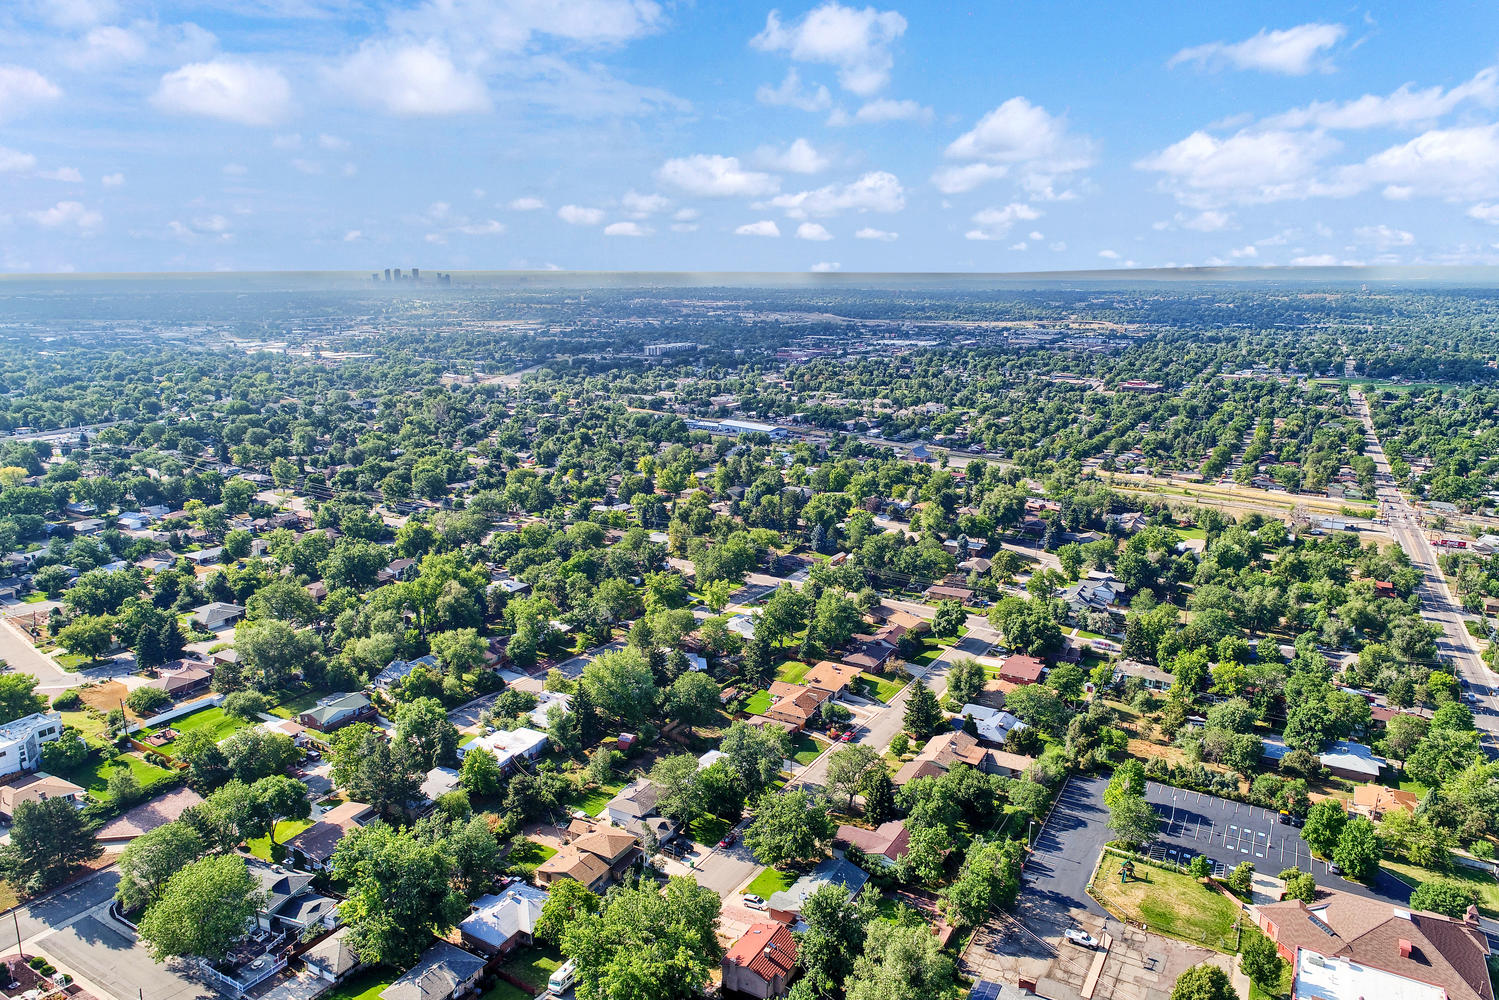 8340 W 66th Ave Arvada CO-large-009-1-Aerial-1499x1000-72dpi.jpg